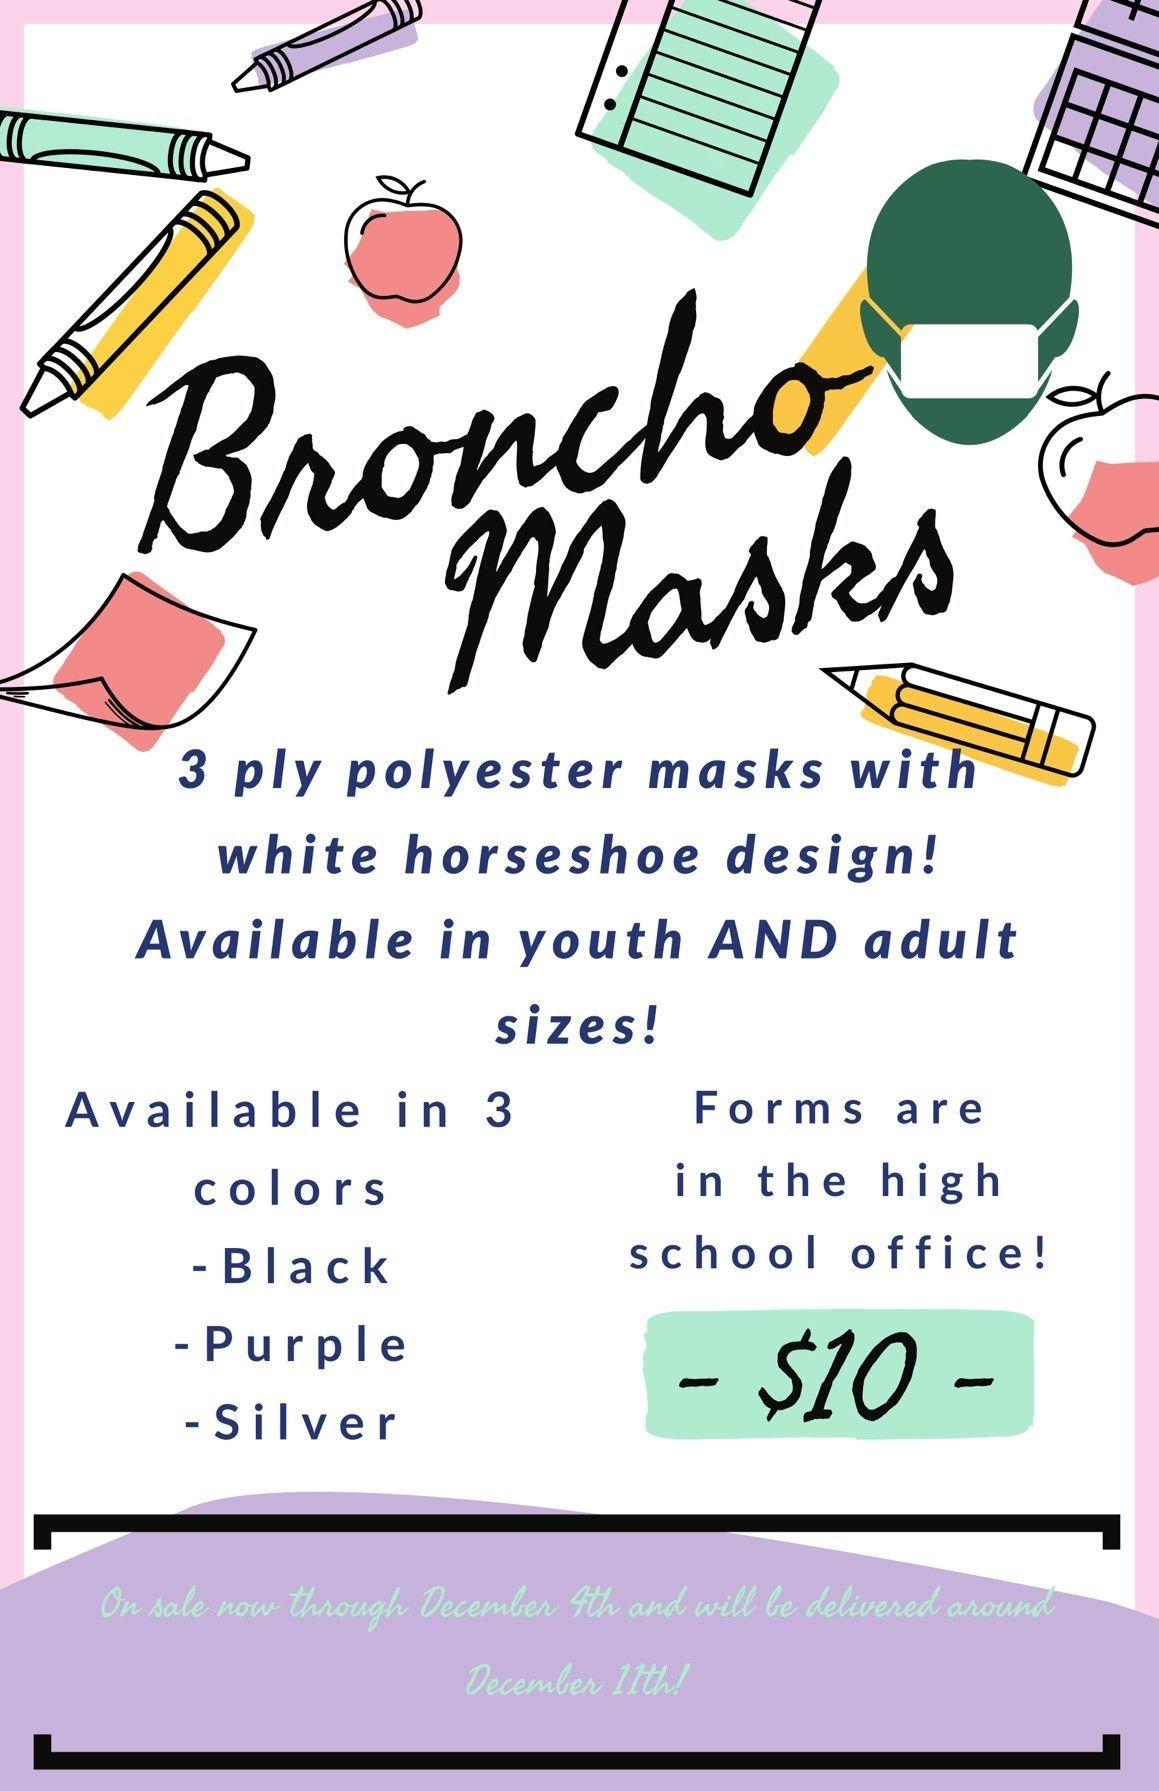 Broncho Israel Exchange Mask Fundraiser - Deadline 12/4